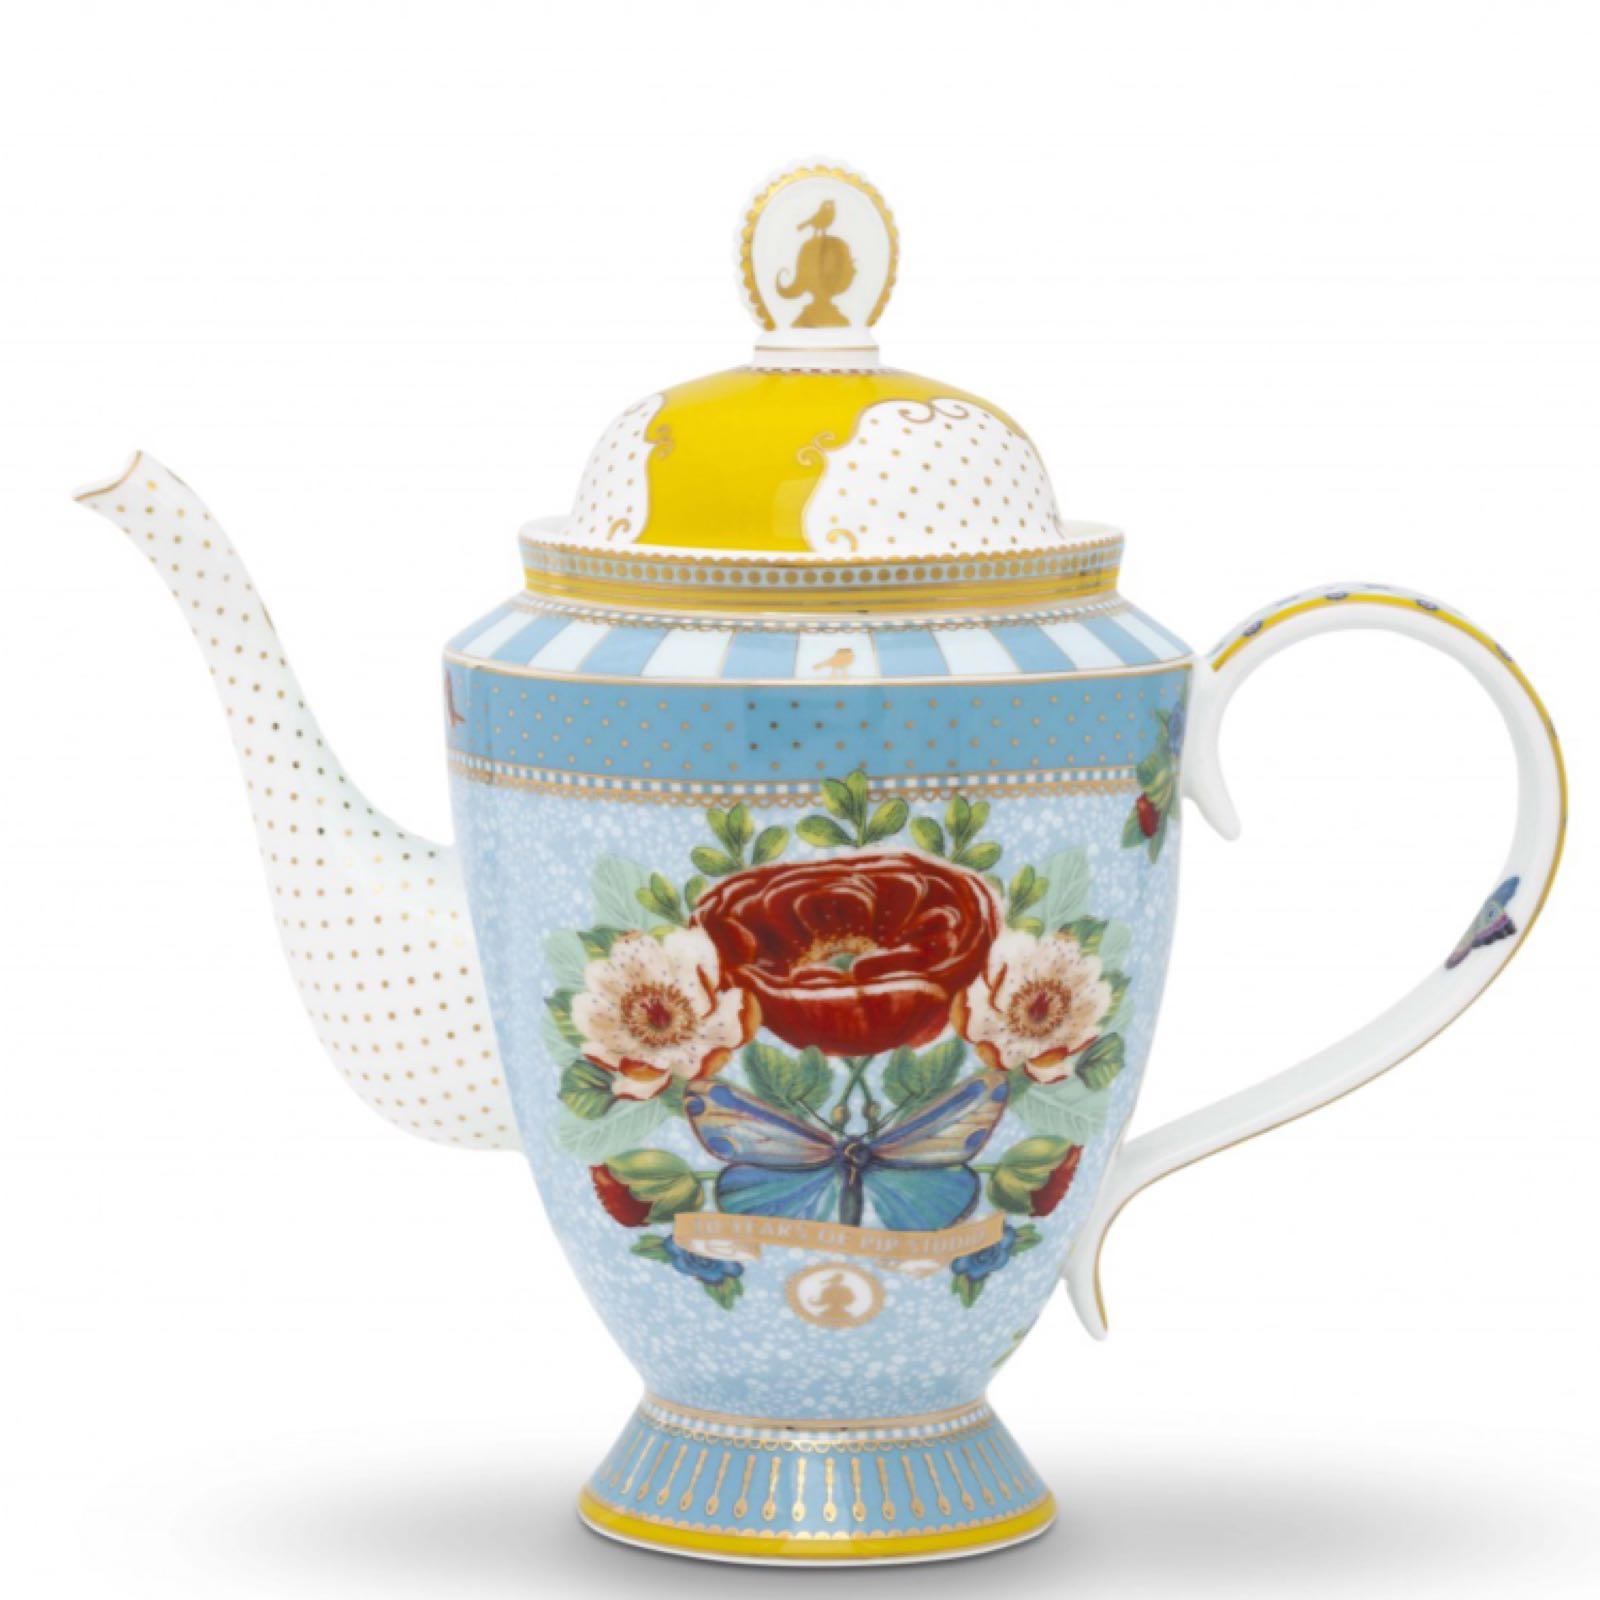 Pip studio Boxed tea pot WAS £49.95